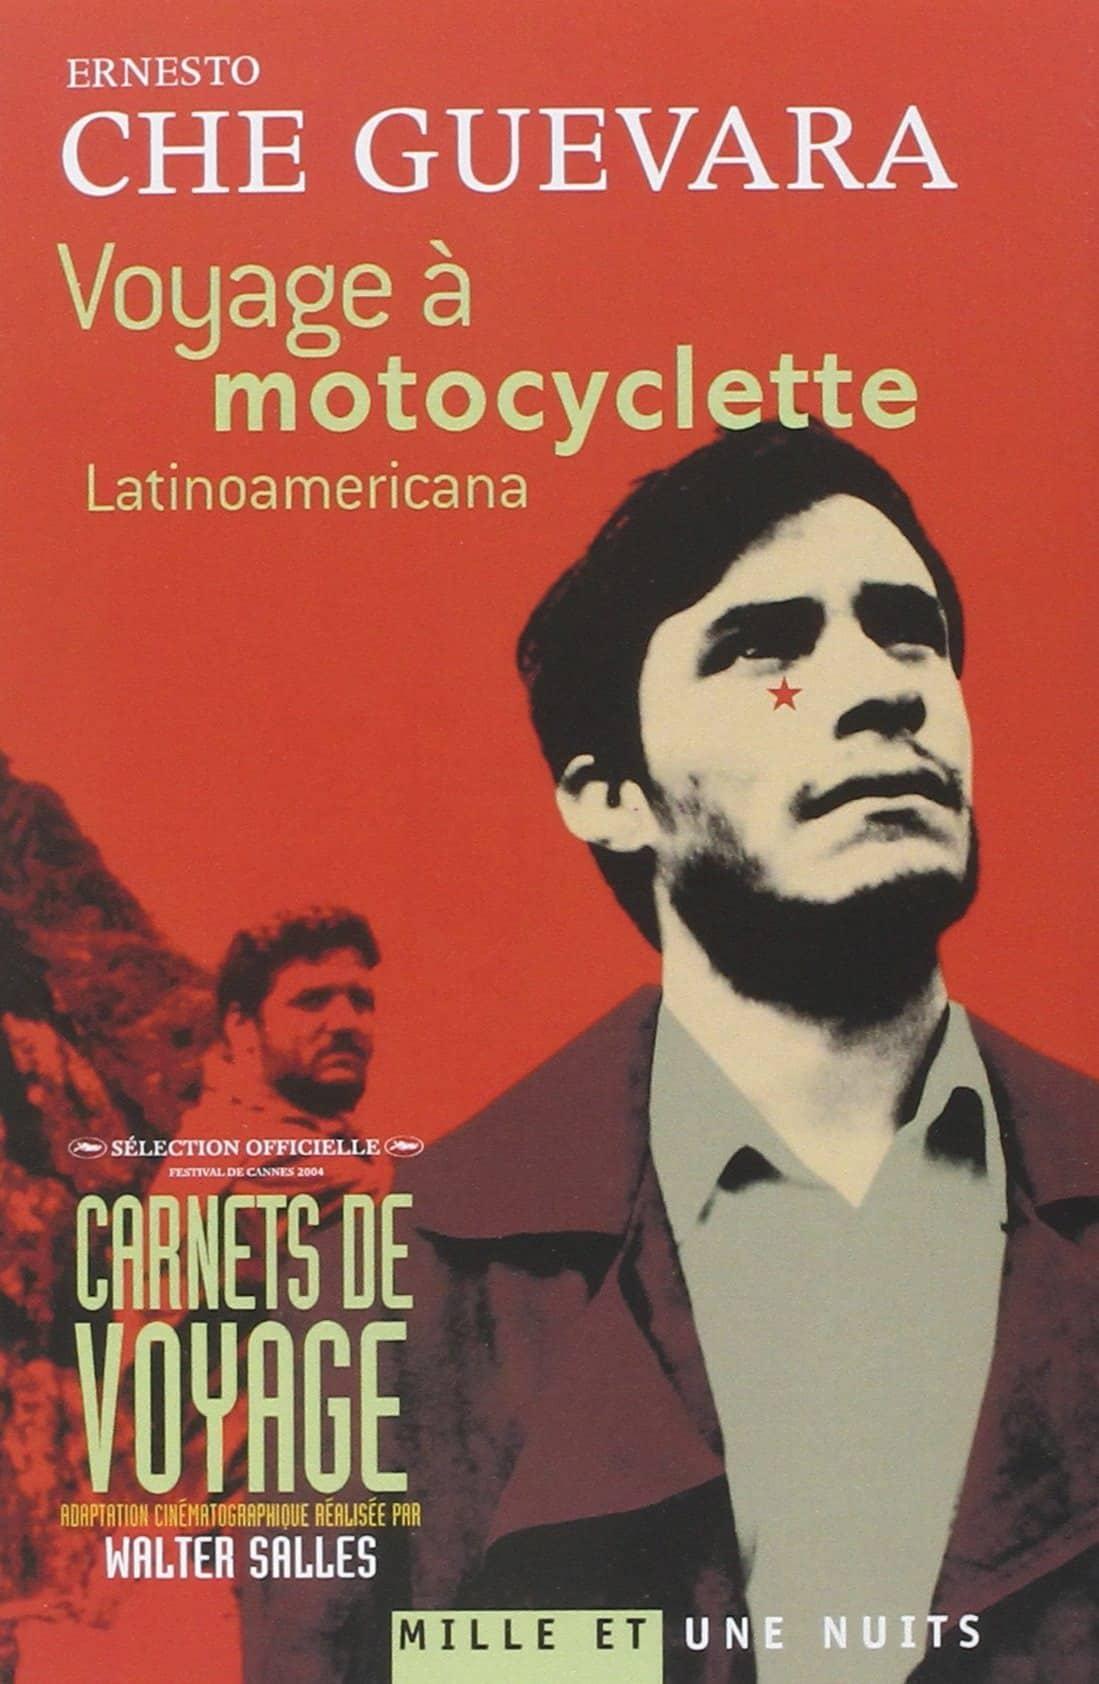 Voyage à motocyclette : Latinoamericana d'Ernesto Che Guevara